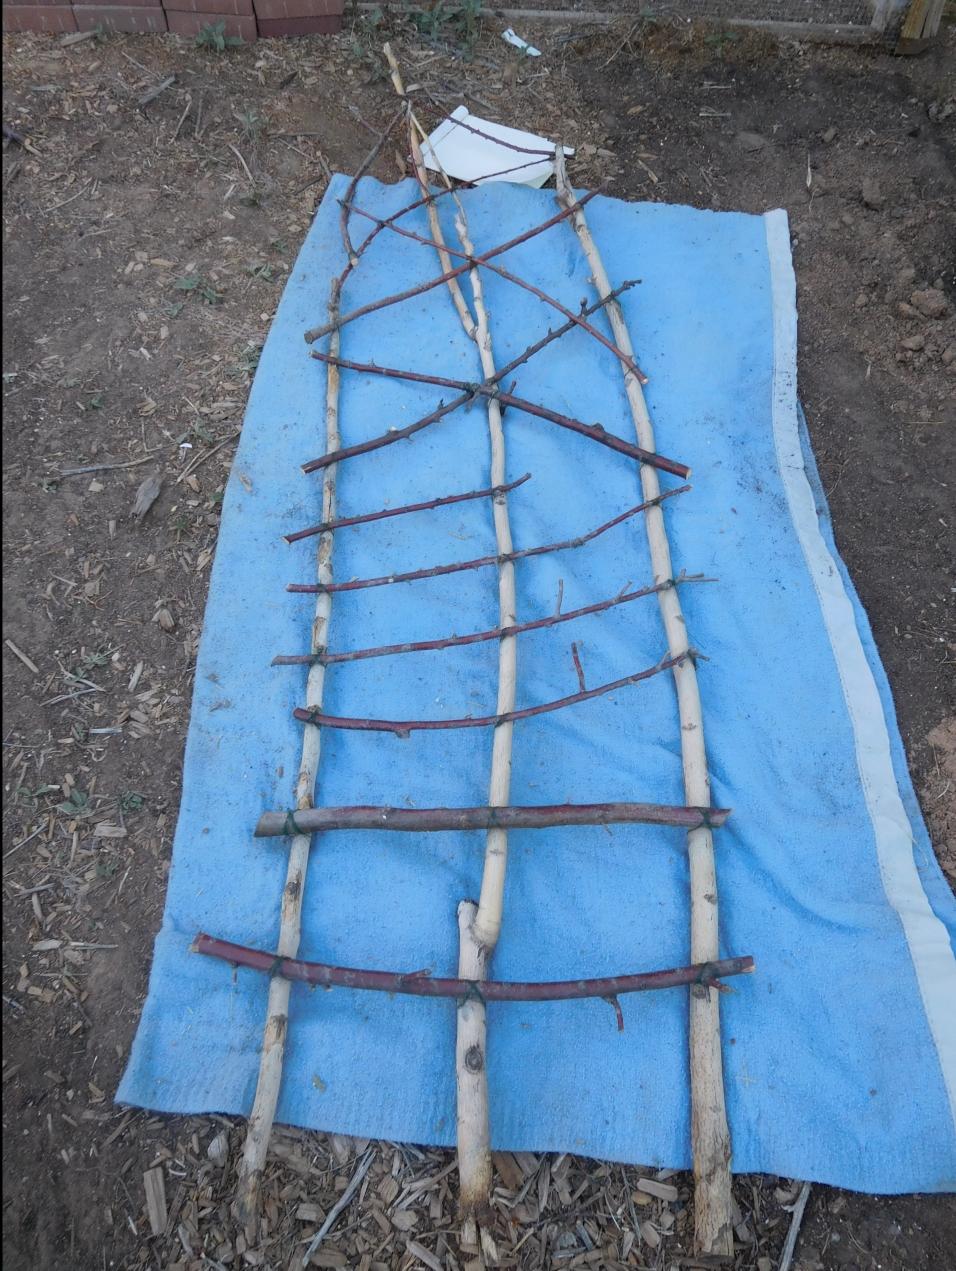 Trellis- Better Cross Pieces laid Out